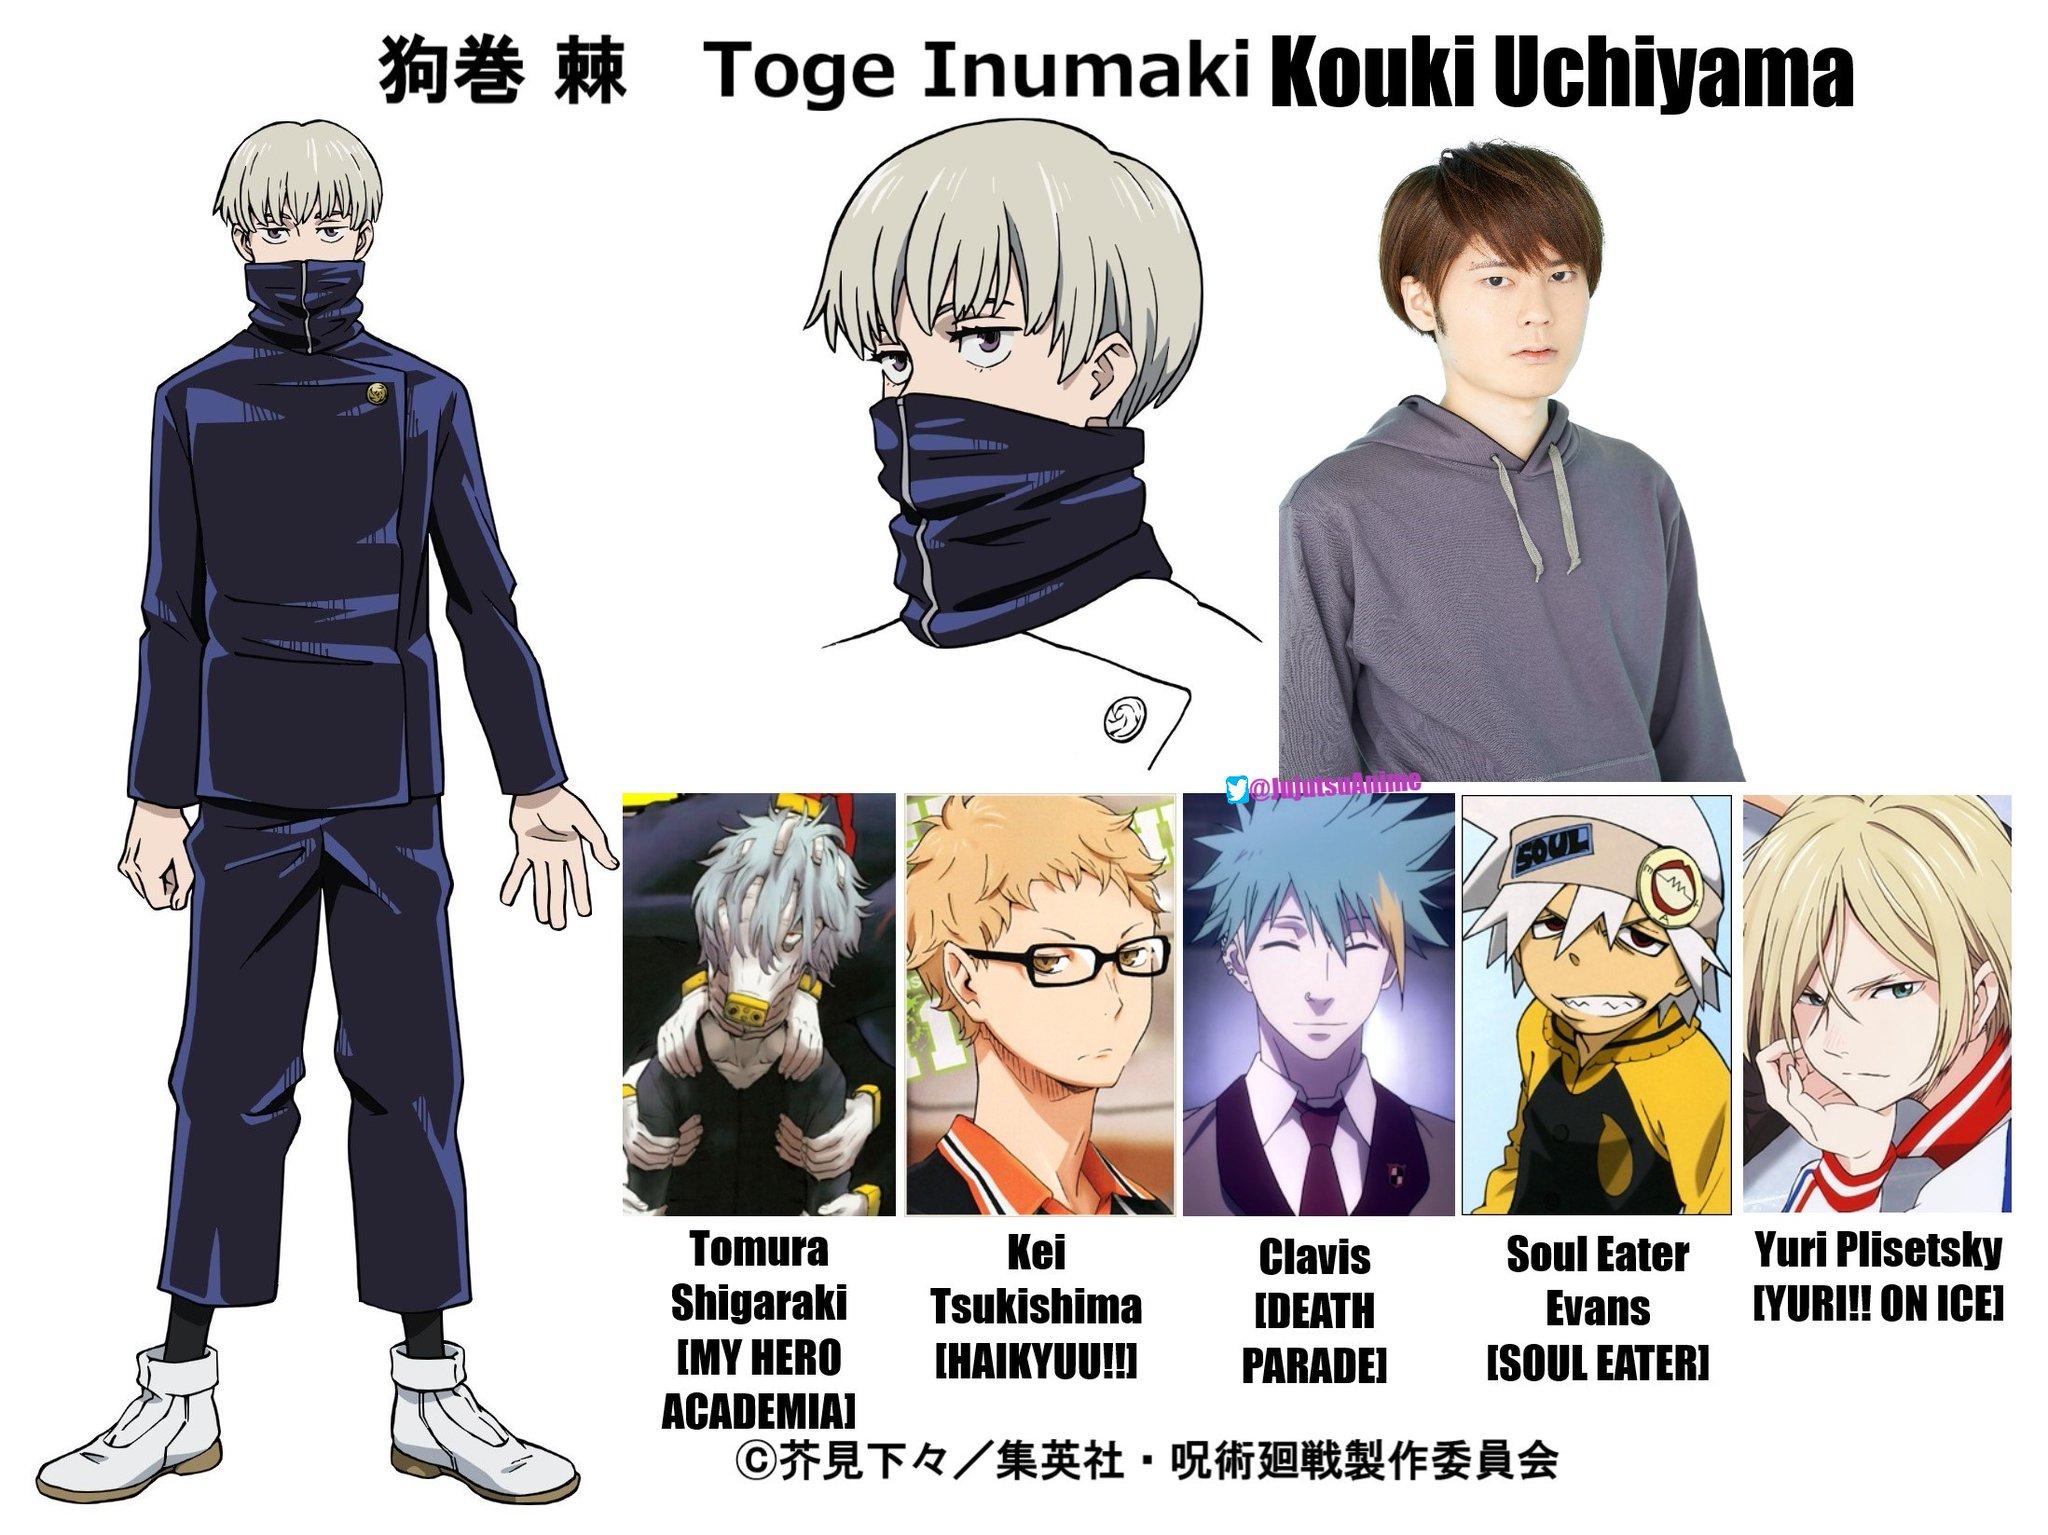 Jujutsu Kaisen Anime W Official Series Translator On Twitter Toge Inumaki Will Be Voiced By Kouki Uchiyama